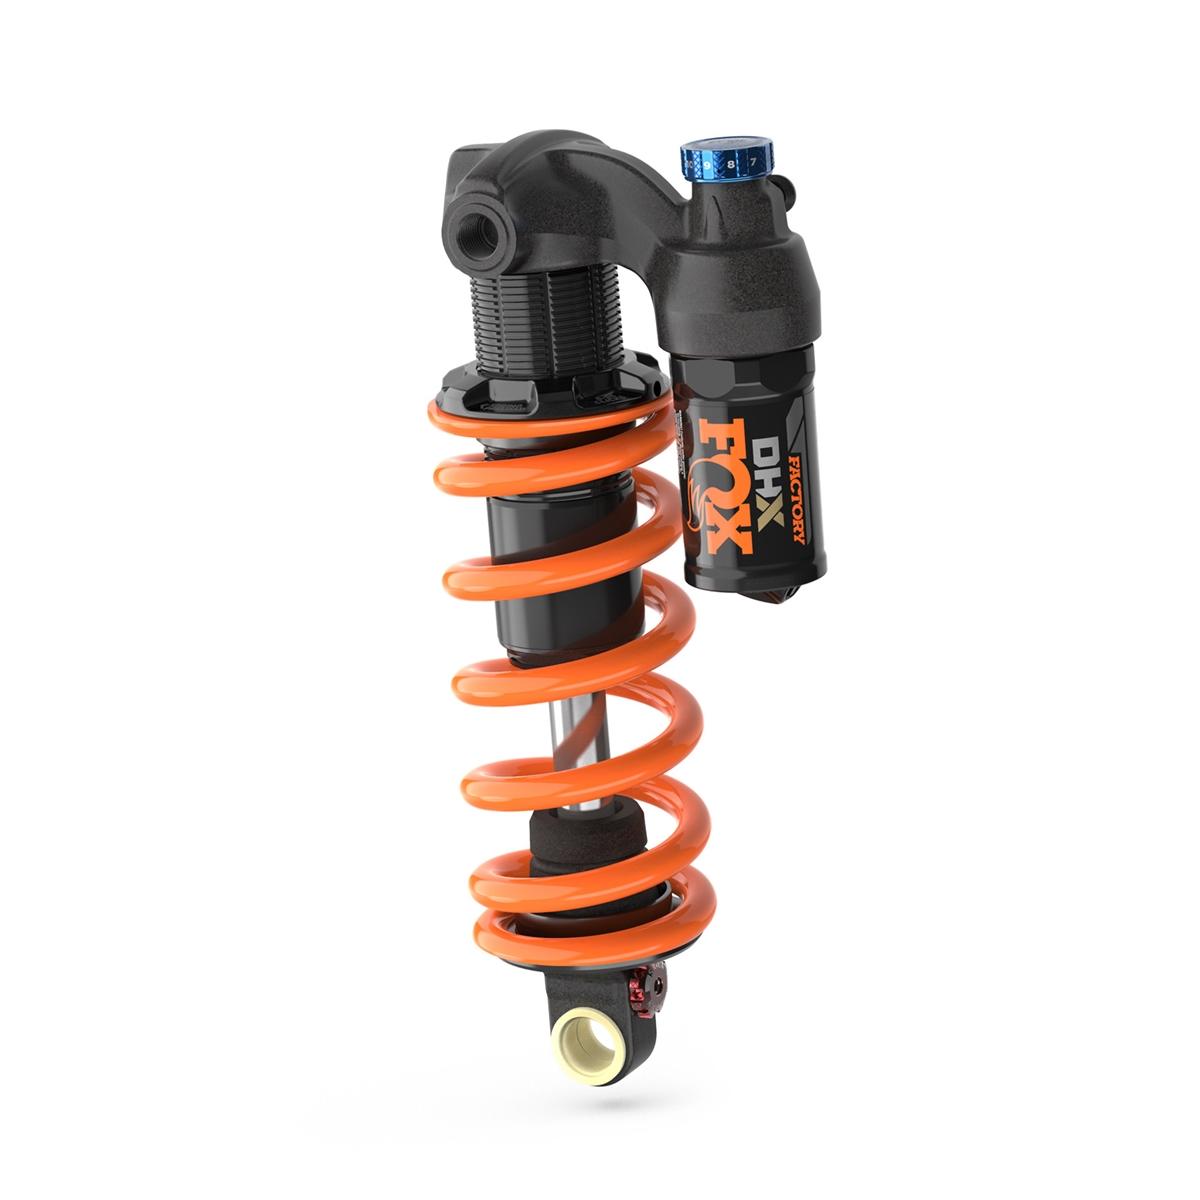 Rear Shock DHX CR Factory 2Pos-Adj CM+ RM Rezi LM Trunnion Metric 185x55mm 2022 Without Spring